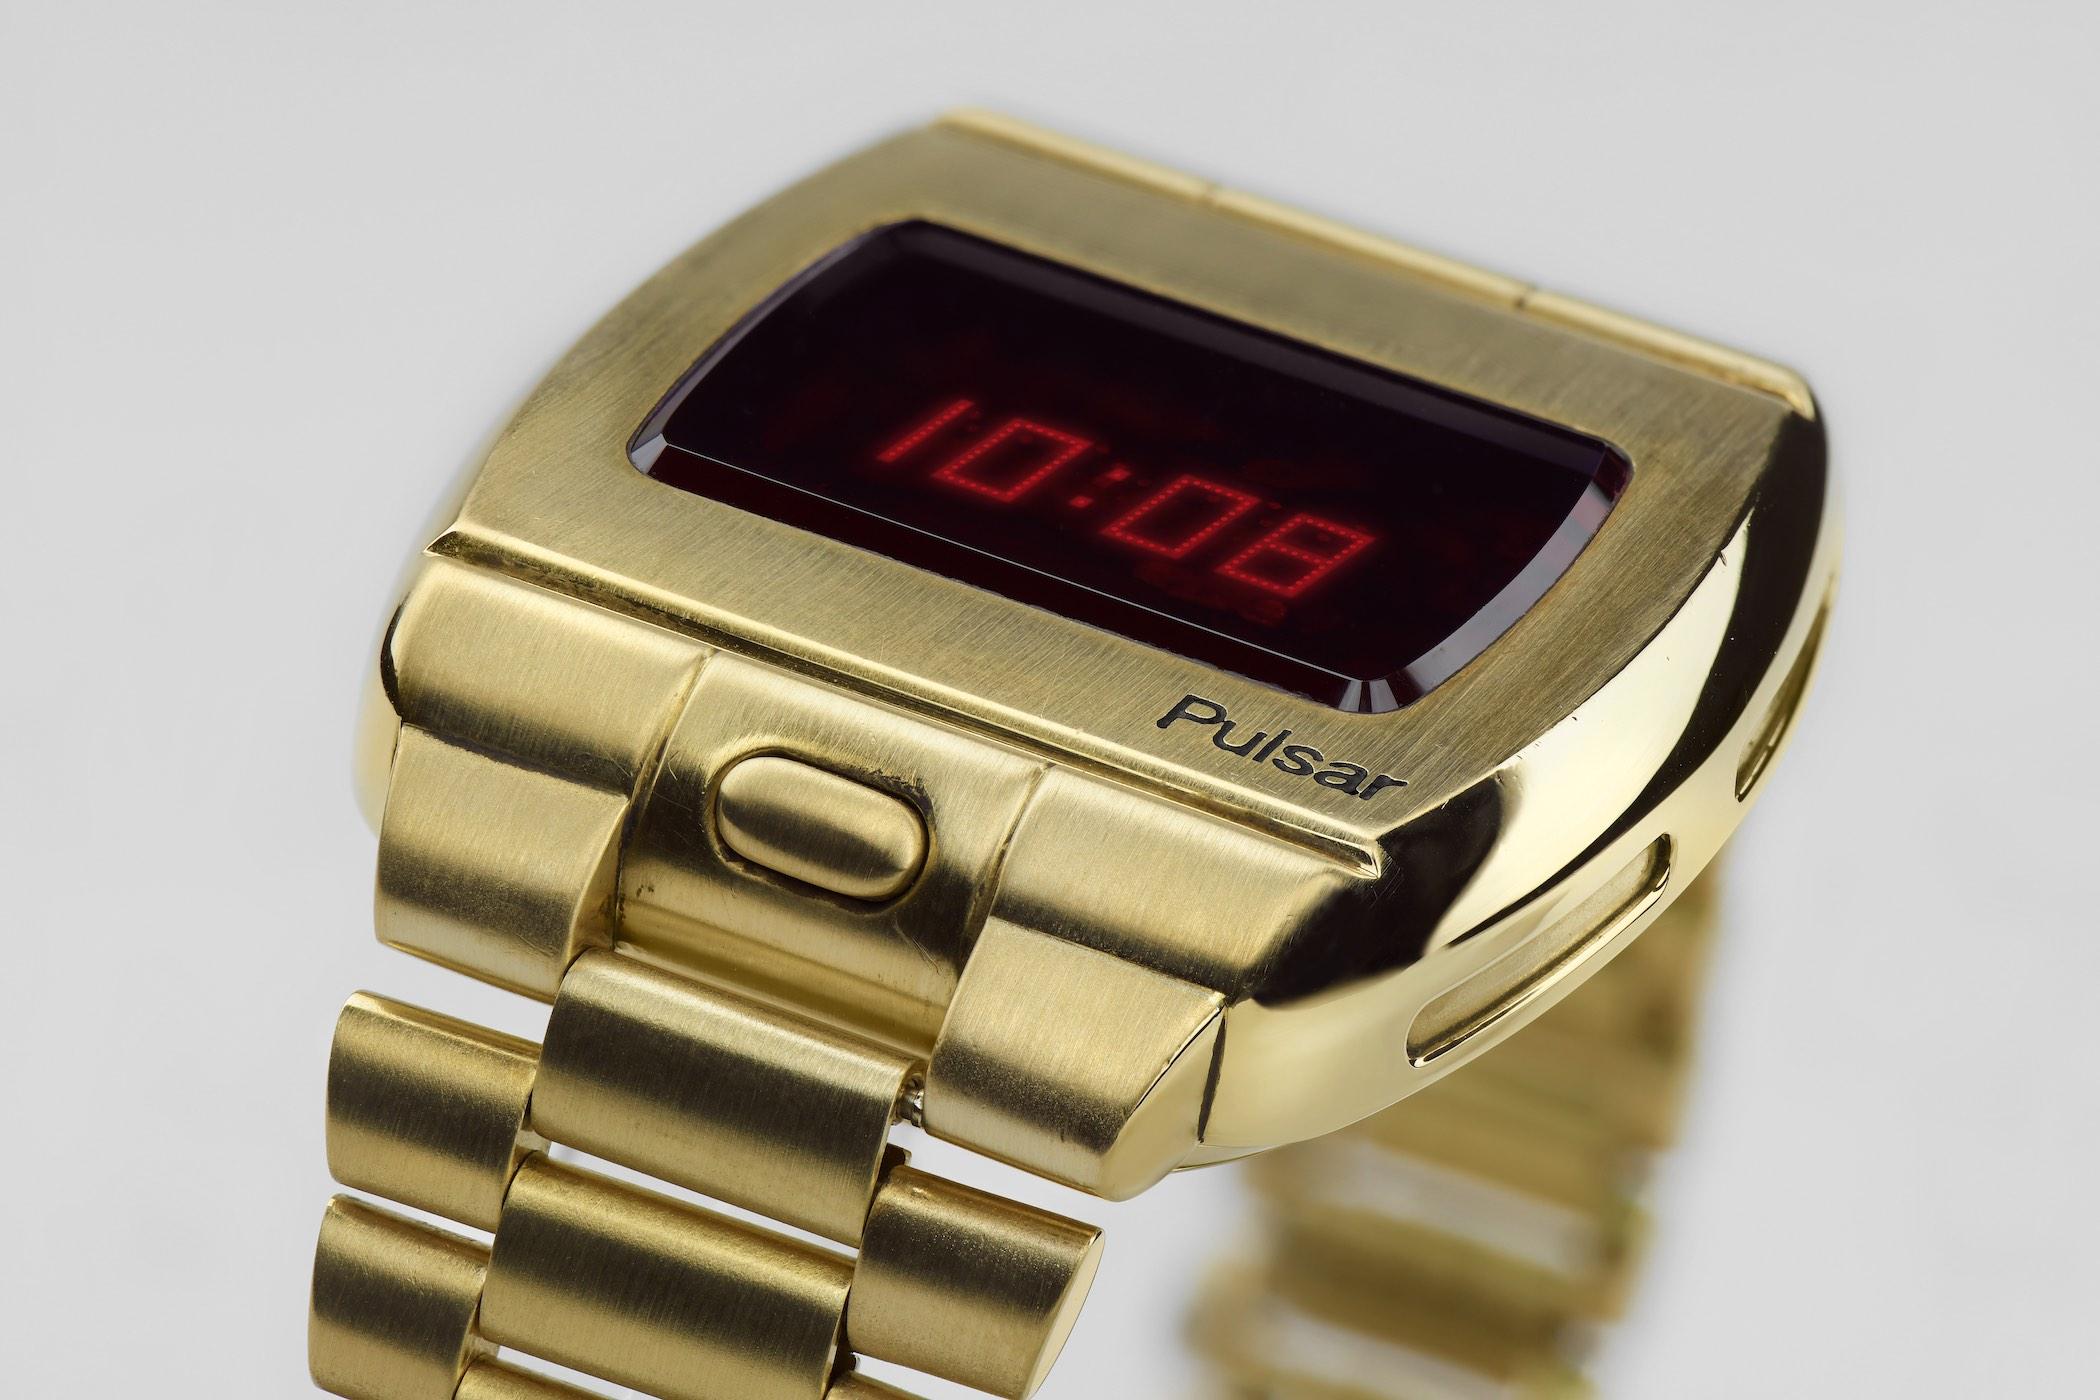 Hamilton Pulsar P1 H00000439 first digital watch 1970 - 3